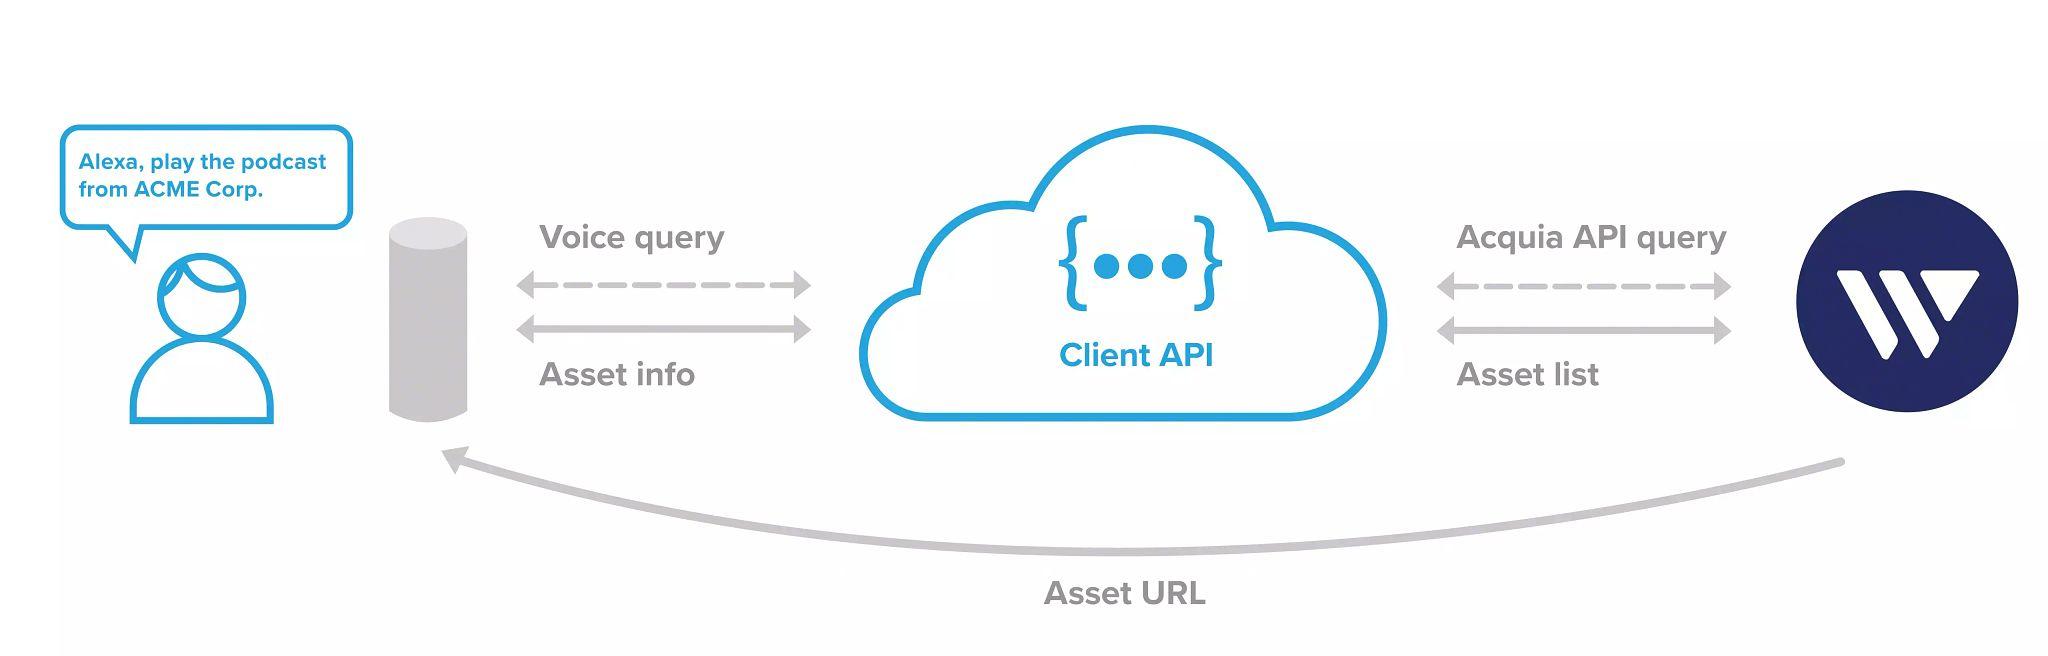 Amazon Alexa to Digital Asset Management API Infographic